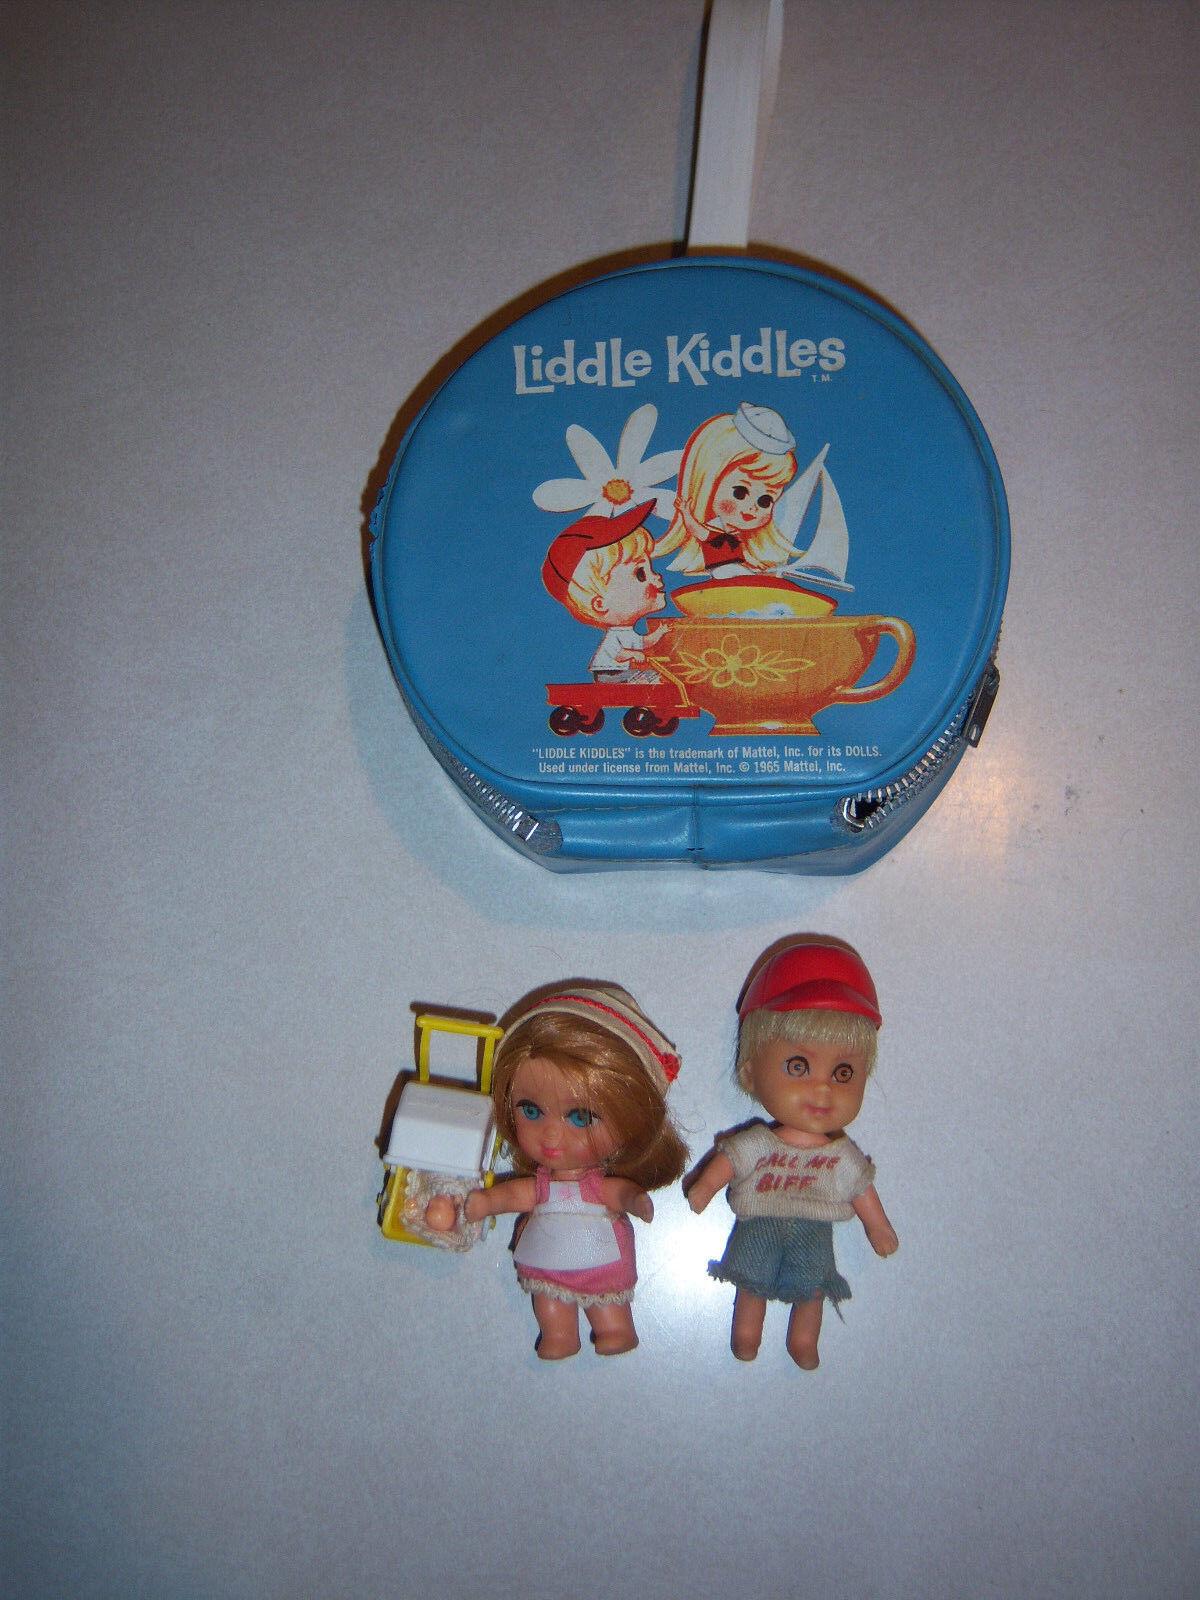 VTG CUTE HTF MATTEL LIDDLE KIDDLE Blau ROUND  PURSE CASE & 2 DOLL LOT